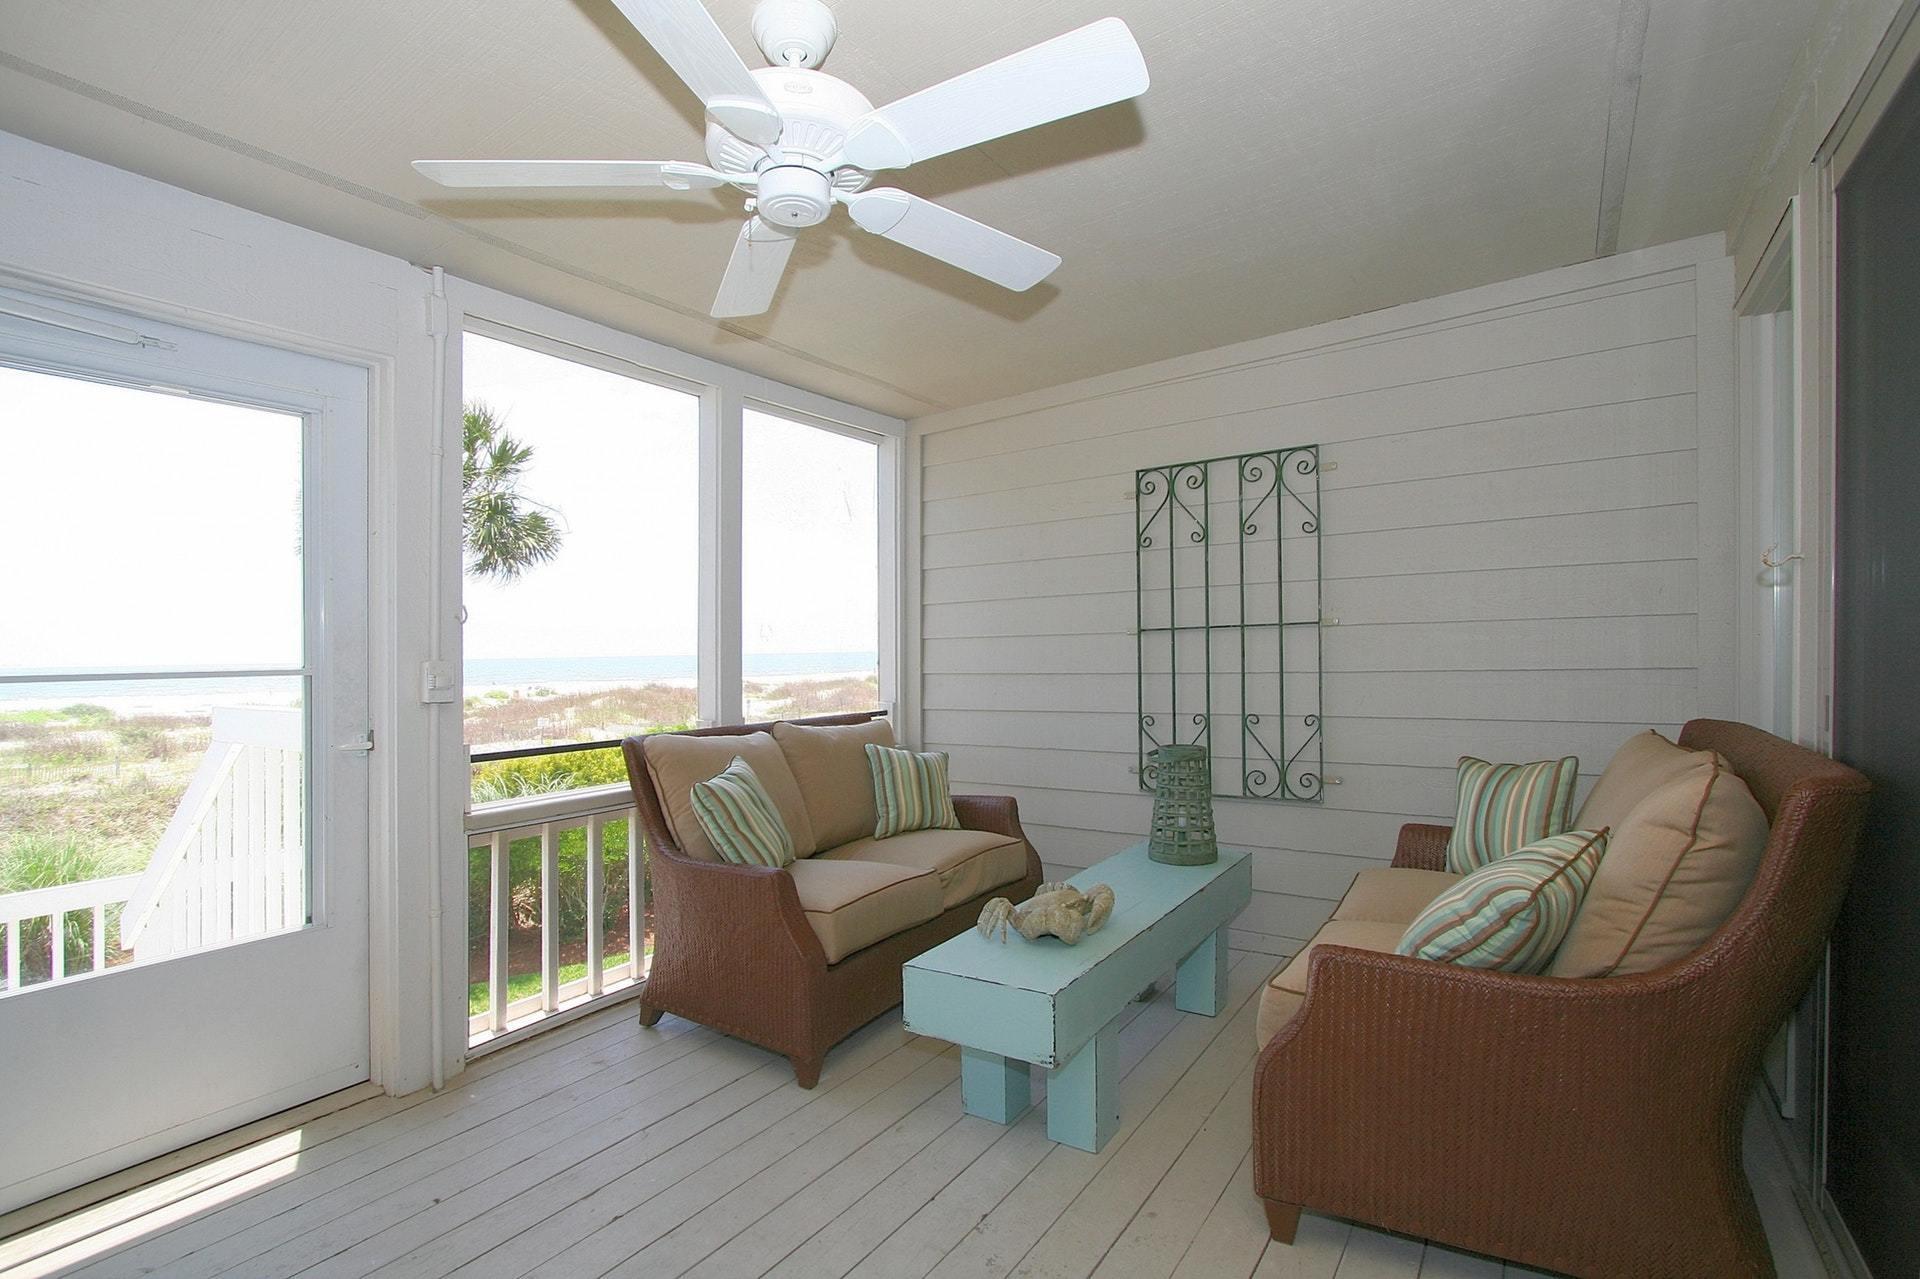 34 Beach Club Villas Isle Of Palms, SC 29451